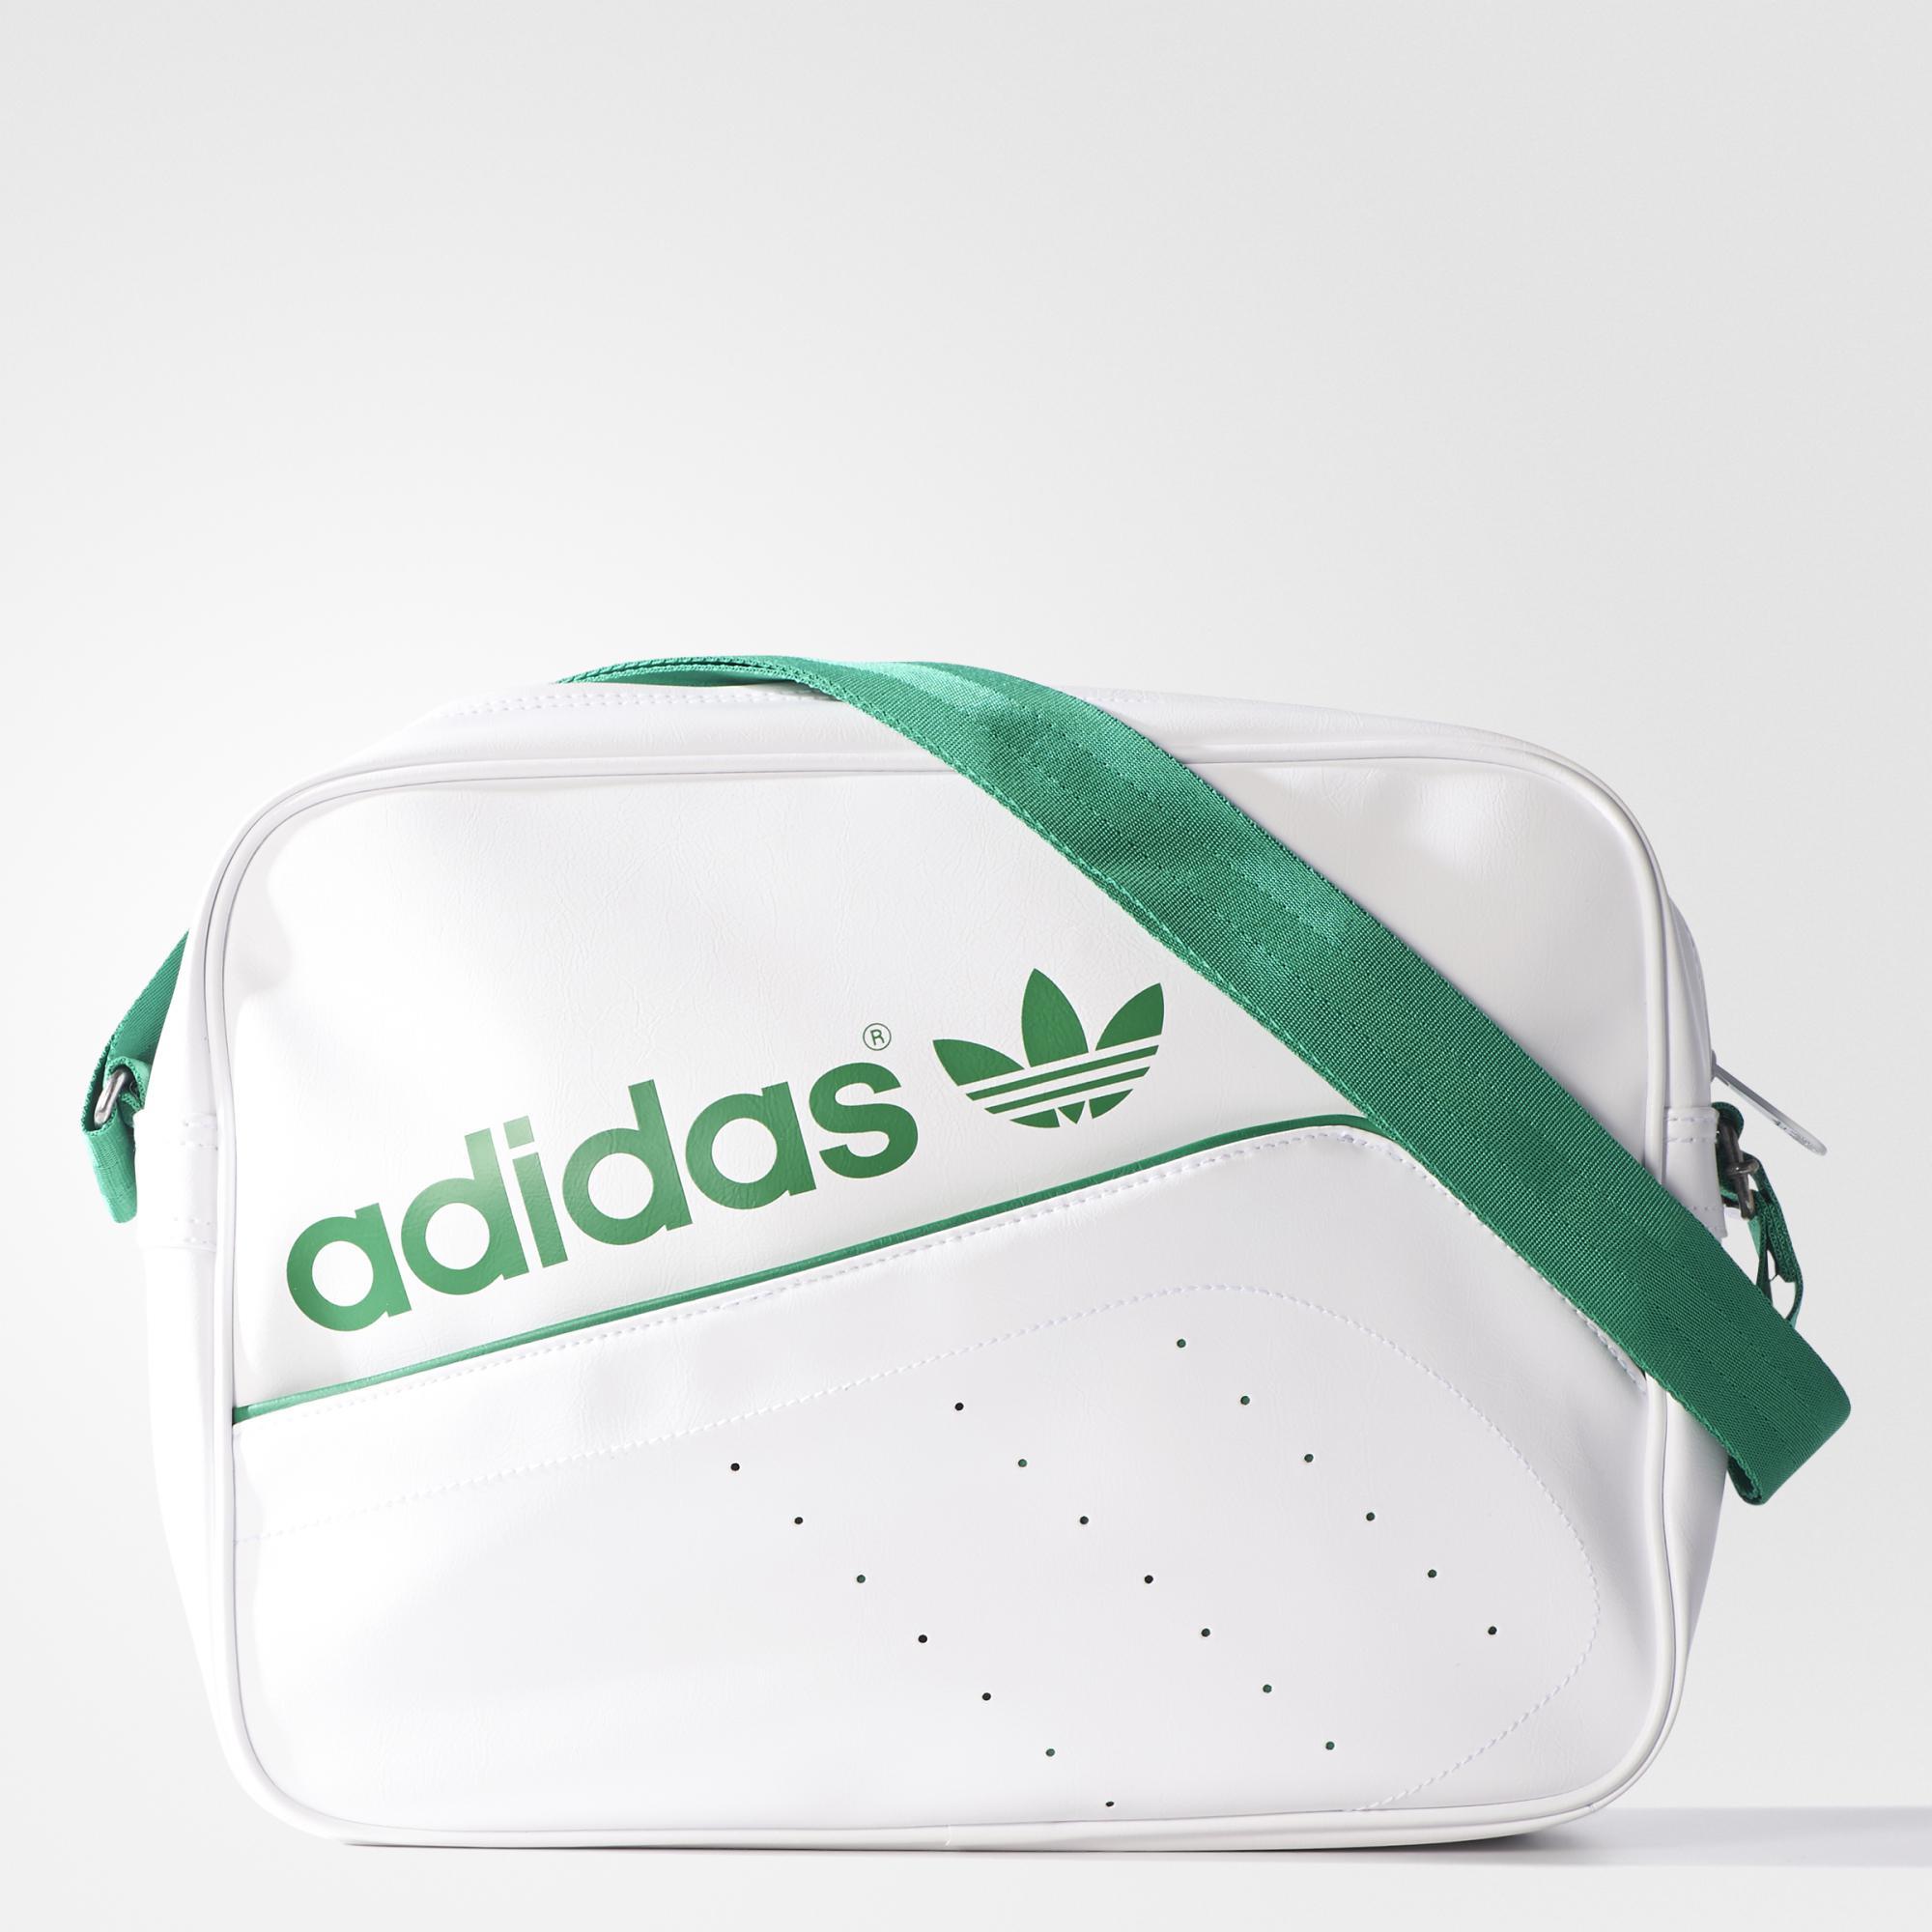 Adidas Adidas Bolso Airliner Originals Perforatedblancoverde N8wPk0nOX